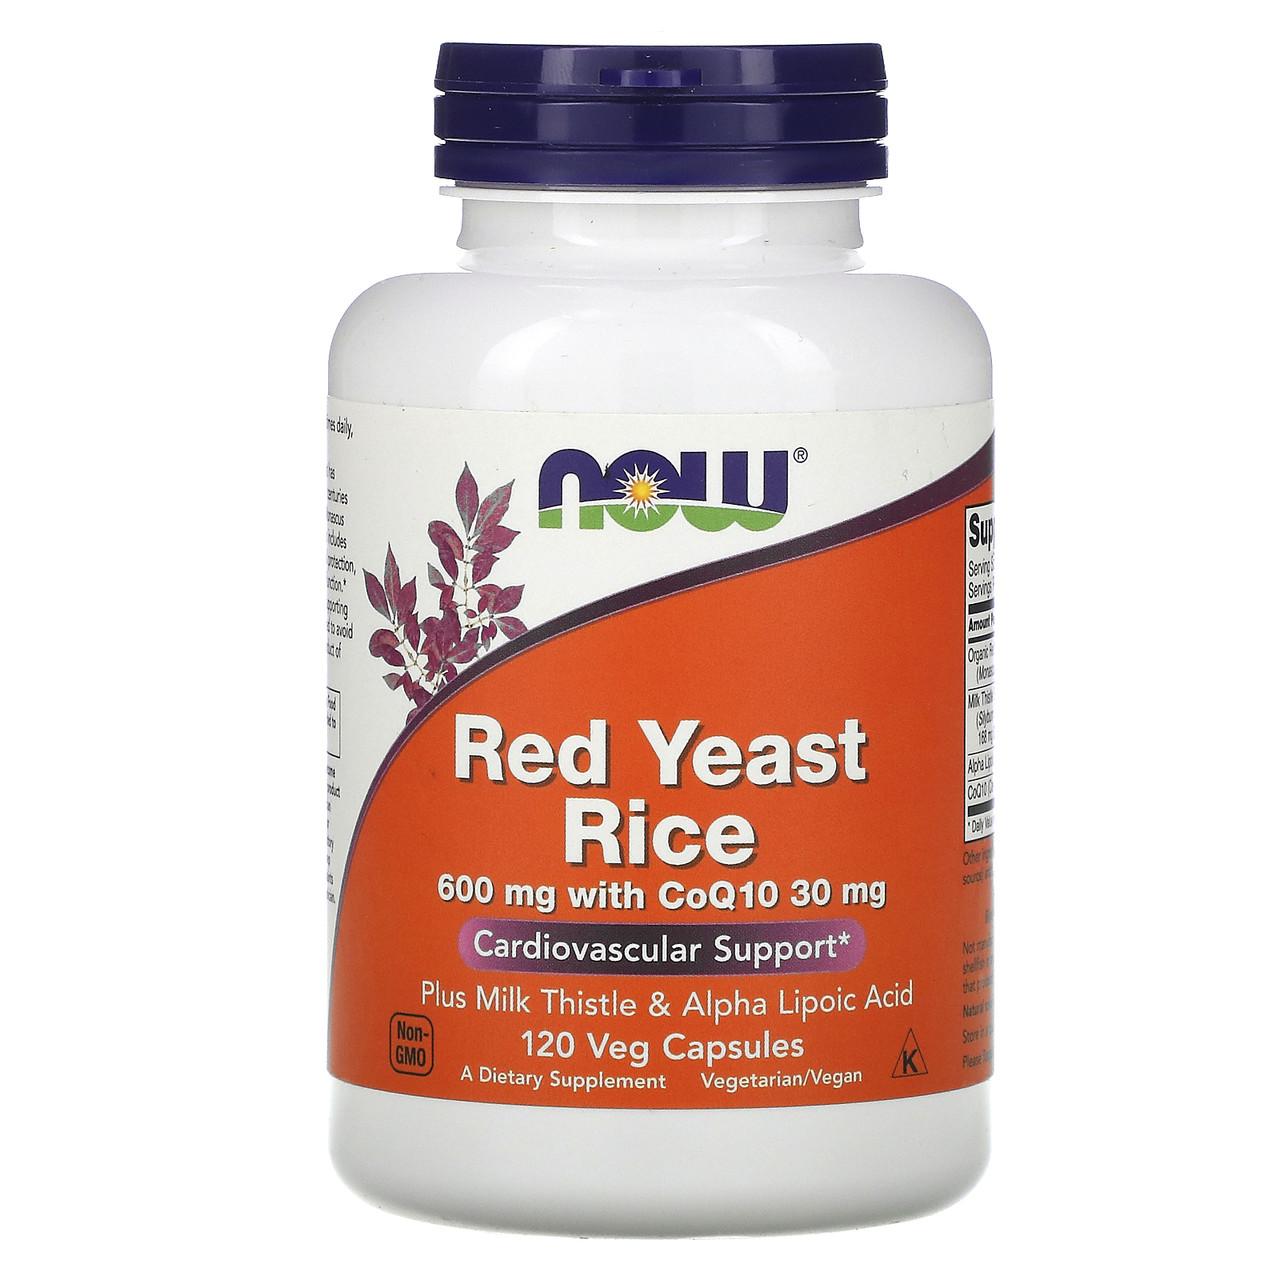 Коензим Q10 (Red Yeast Rice, with CoQ10), Now Foods, Червоний рис, 600 мг, 120 капсул